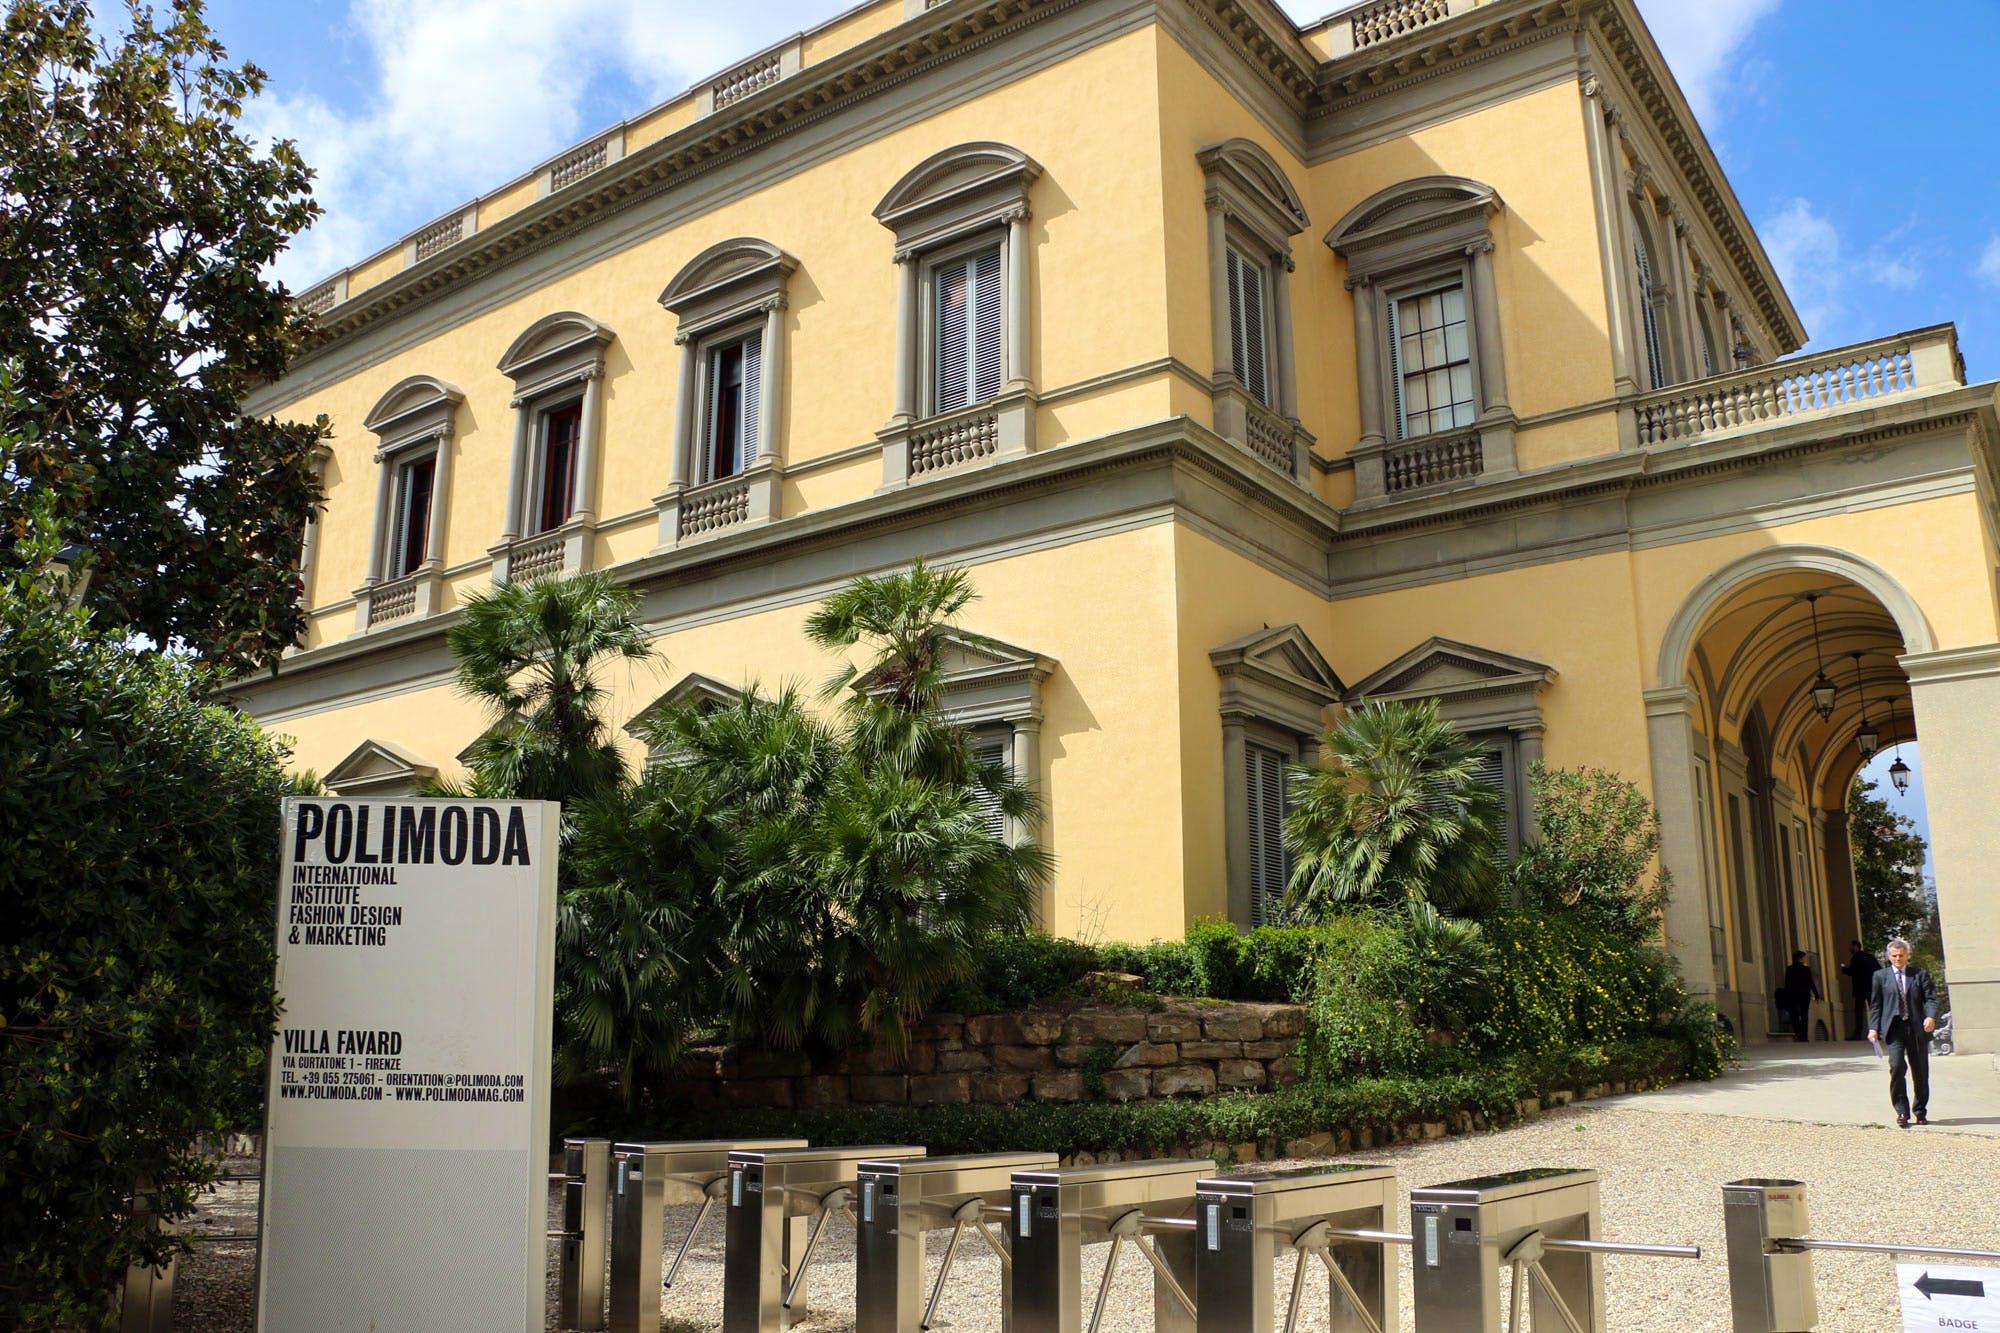 Fashion Design And Fashion Business School In Italy Polimoda Top Italian Fashion Design School